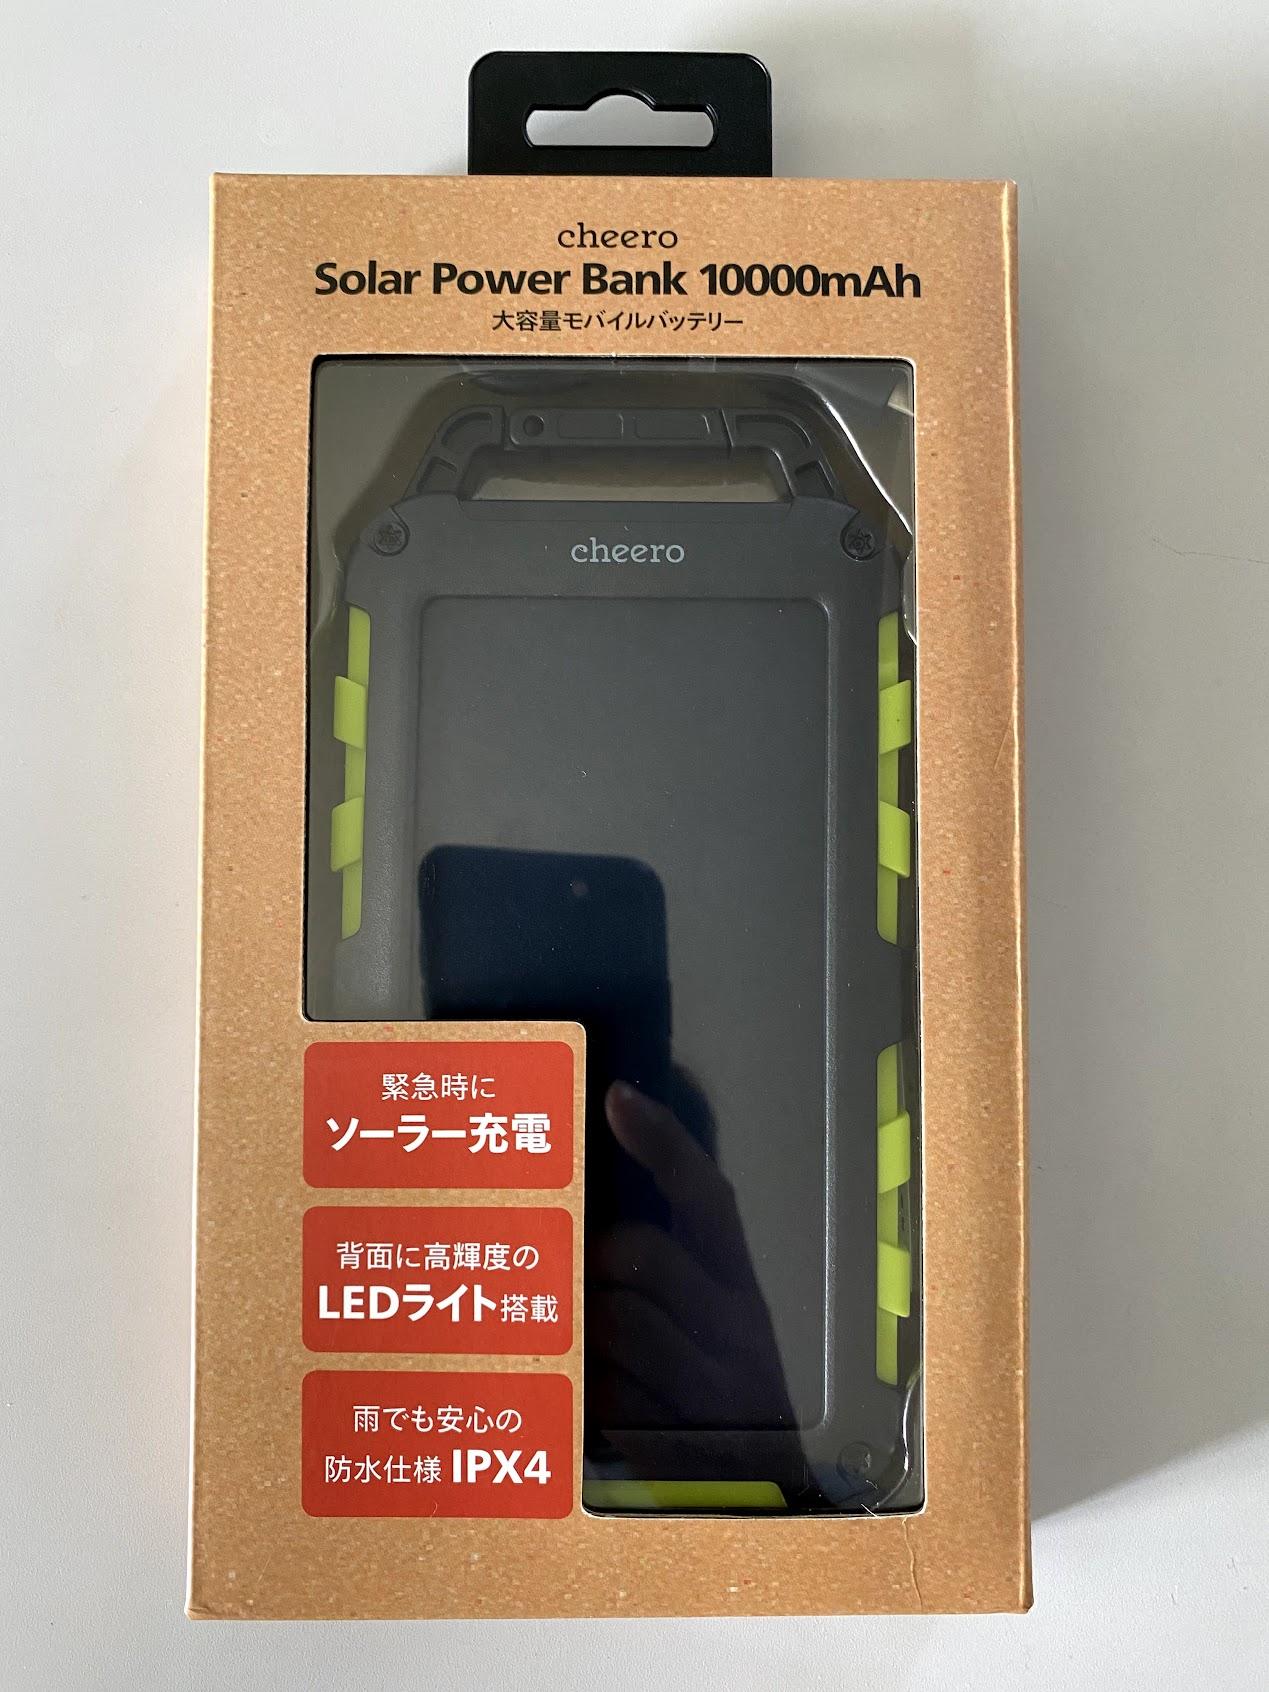 cheero Solar Power Bank 10000mAh 外観